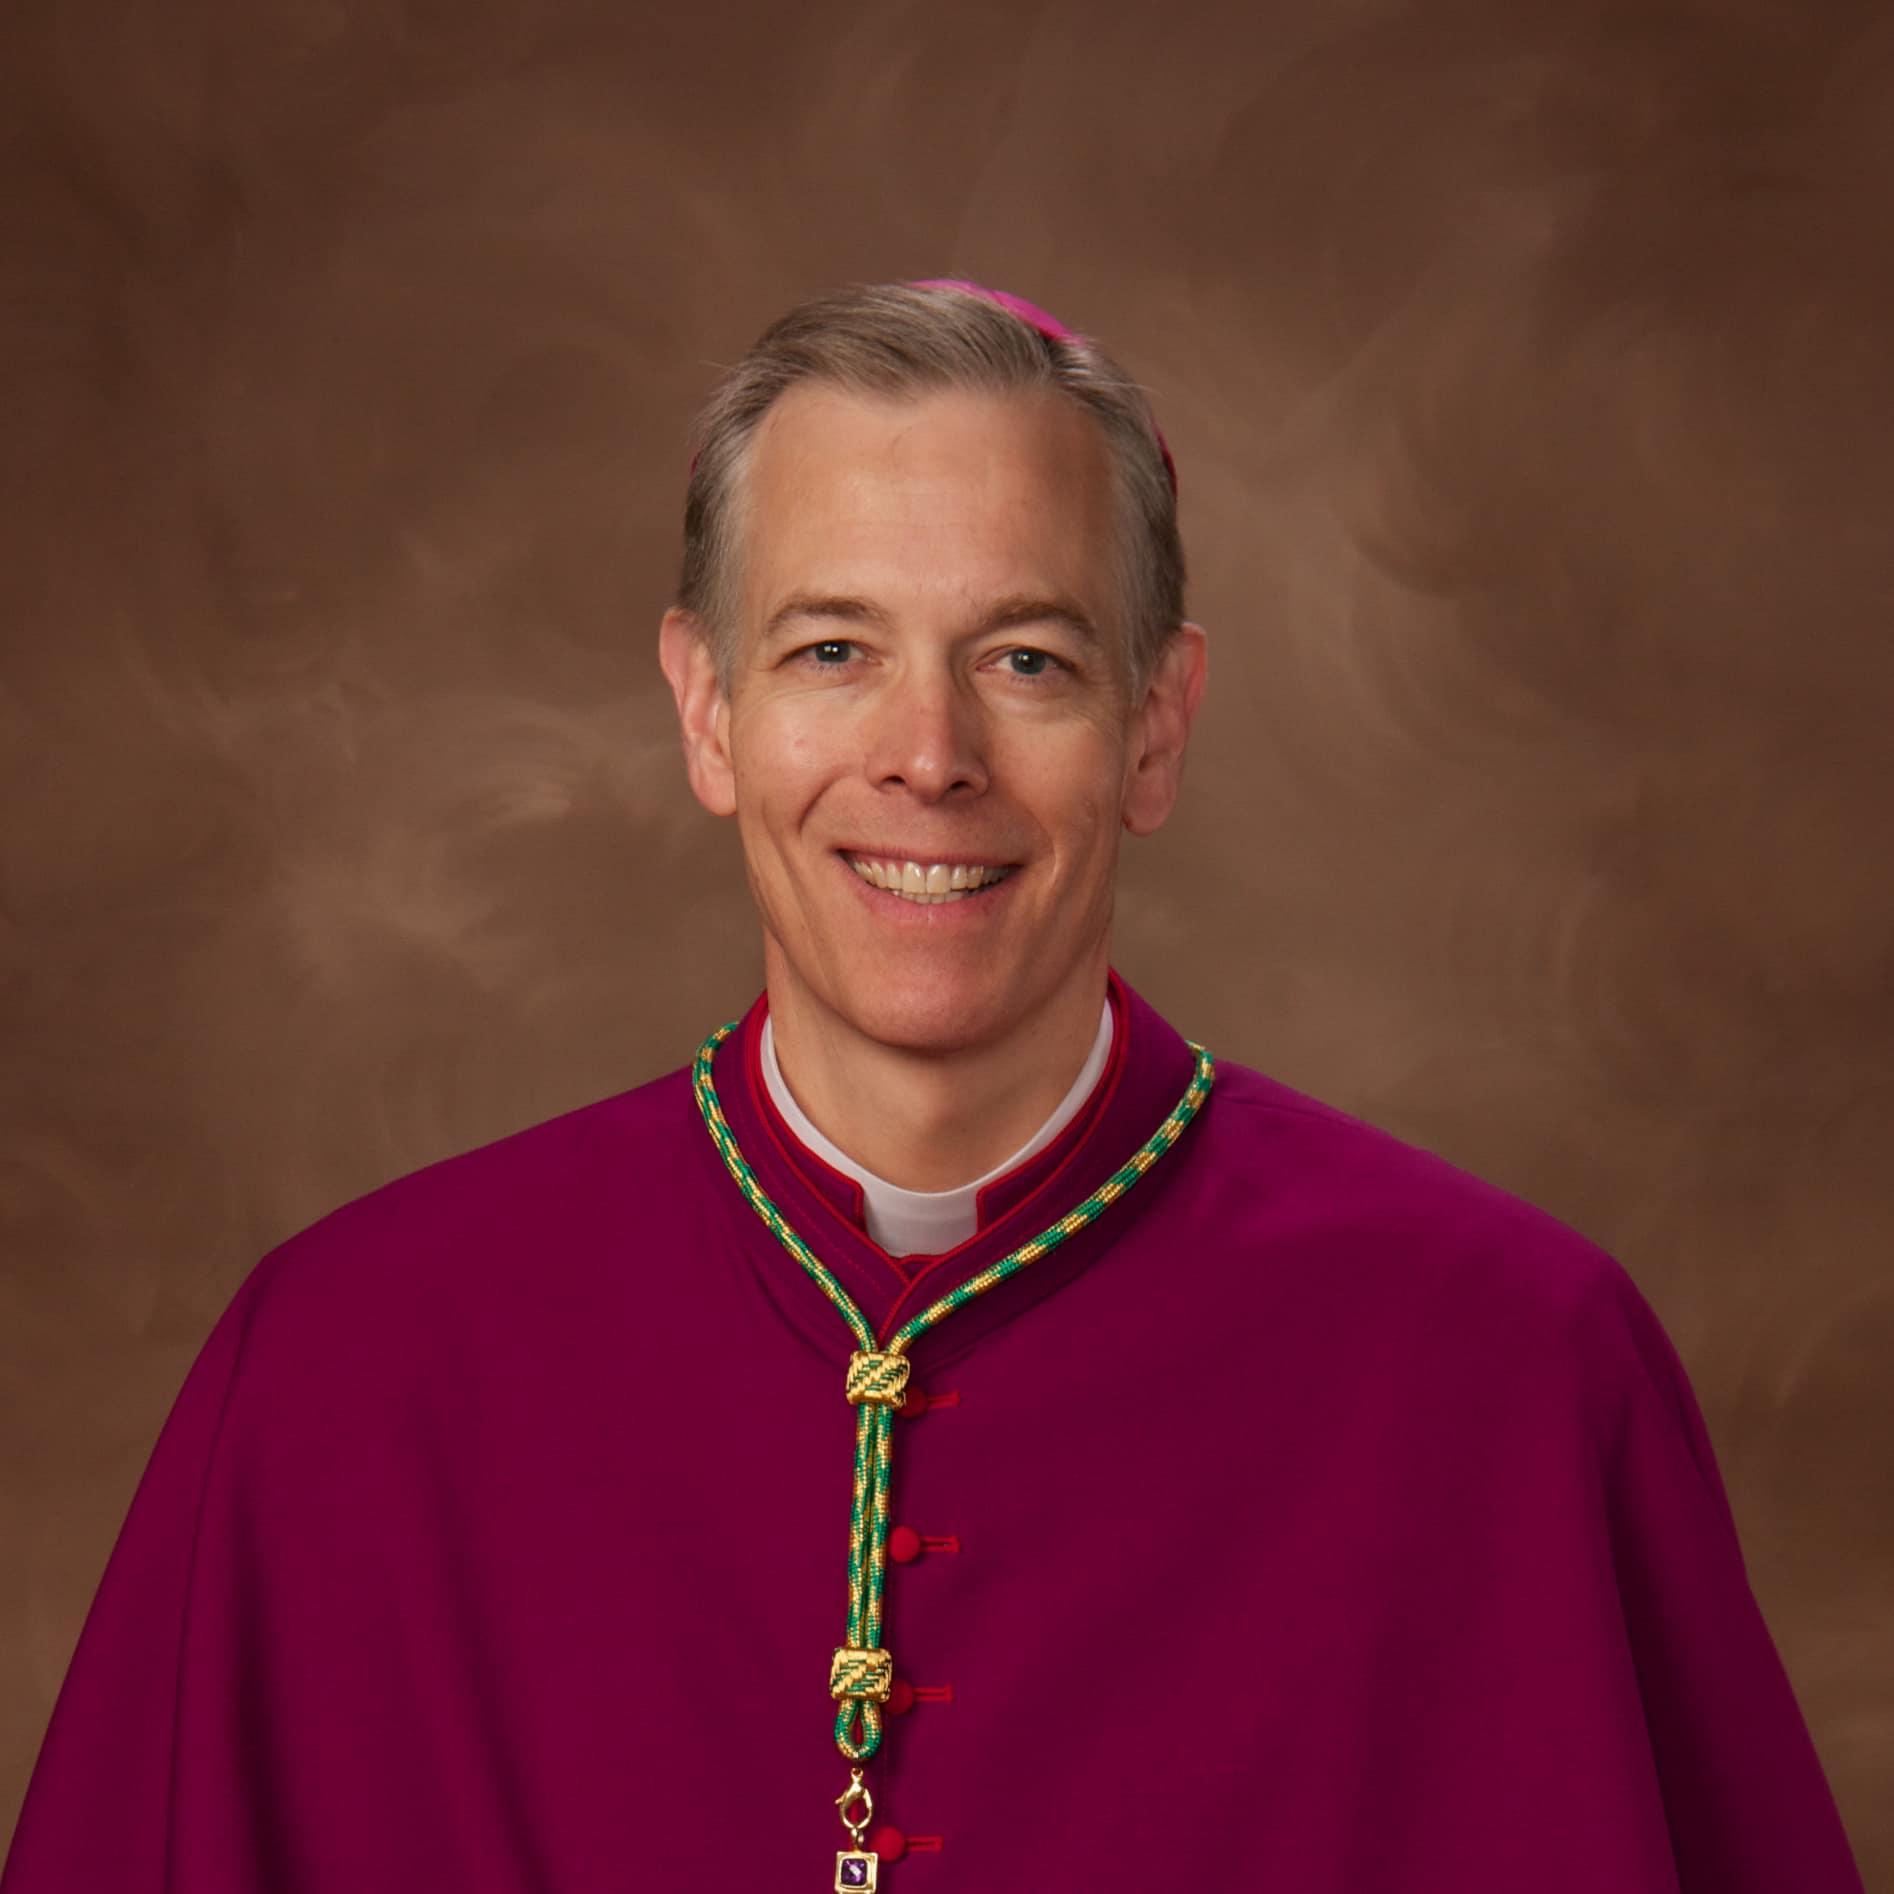 Archbishop Sample